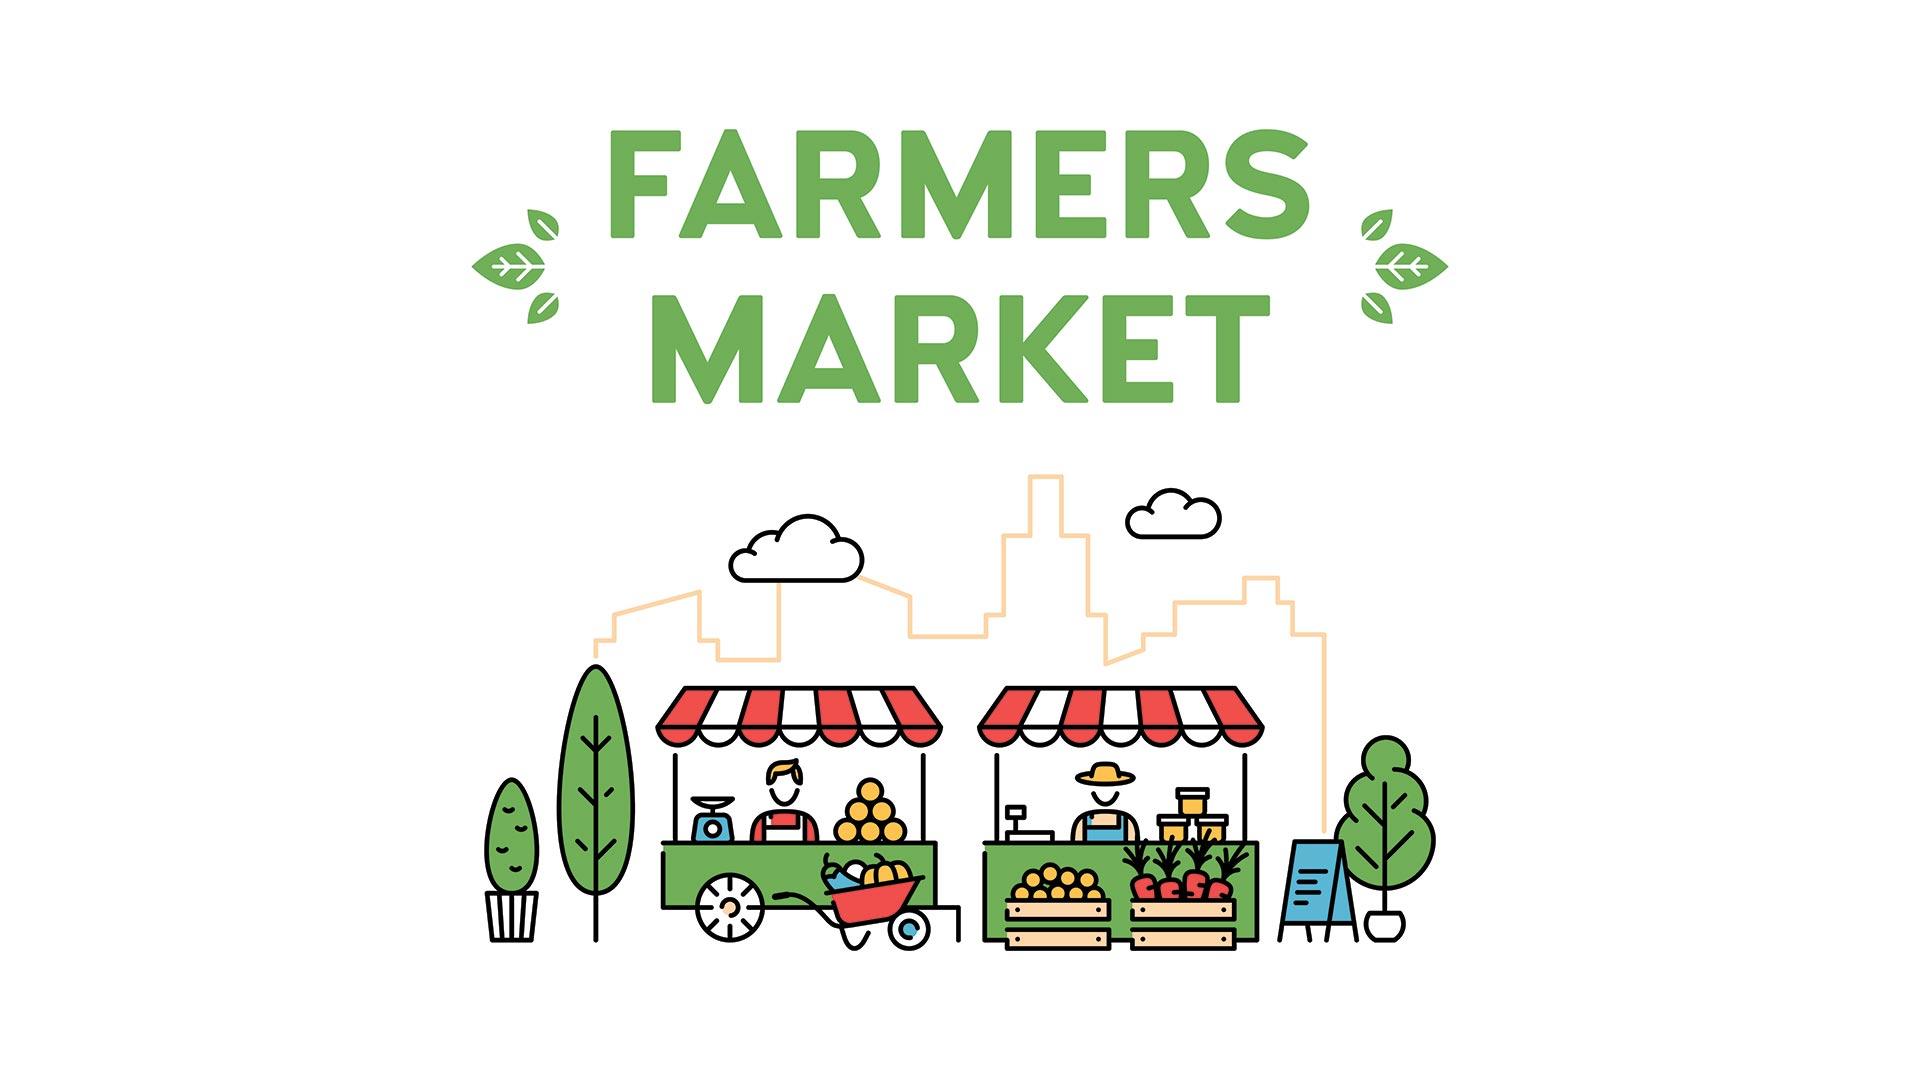 Clip art of farmers market